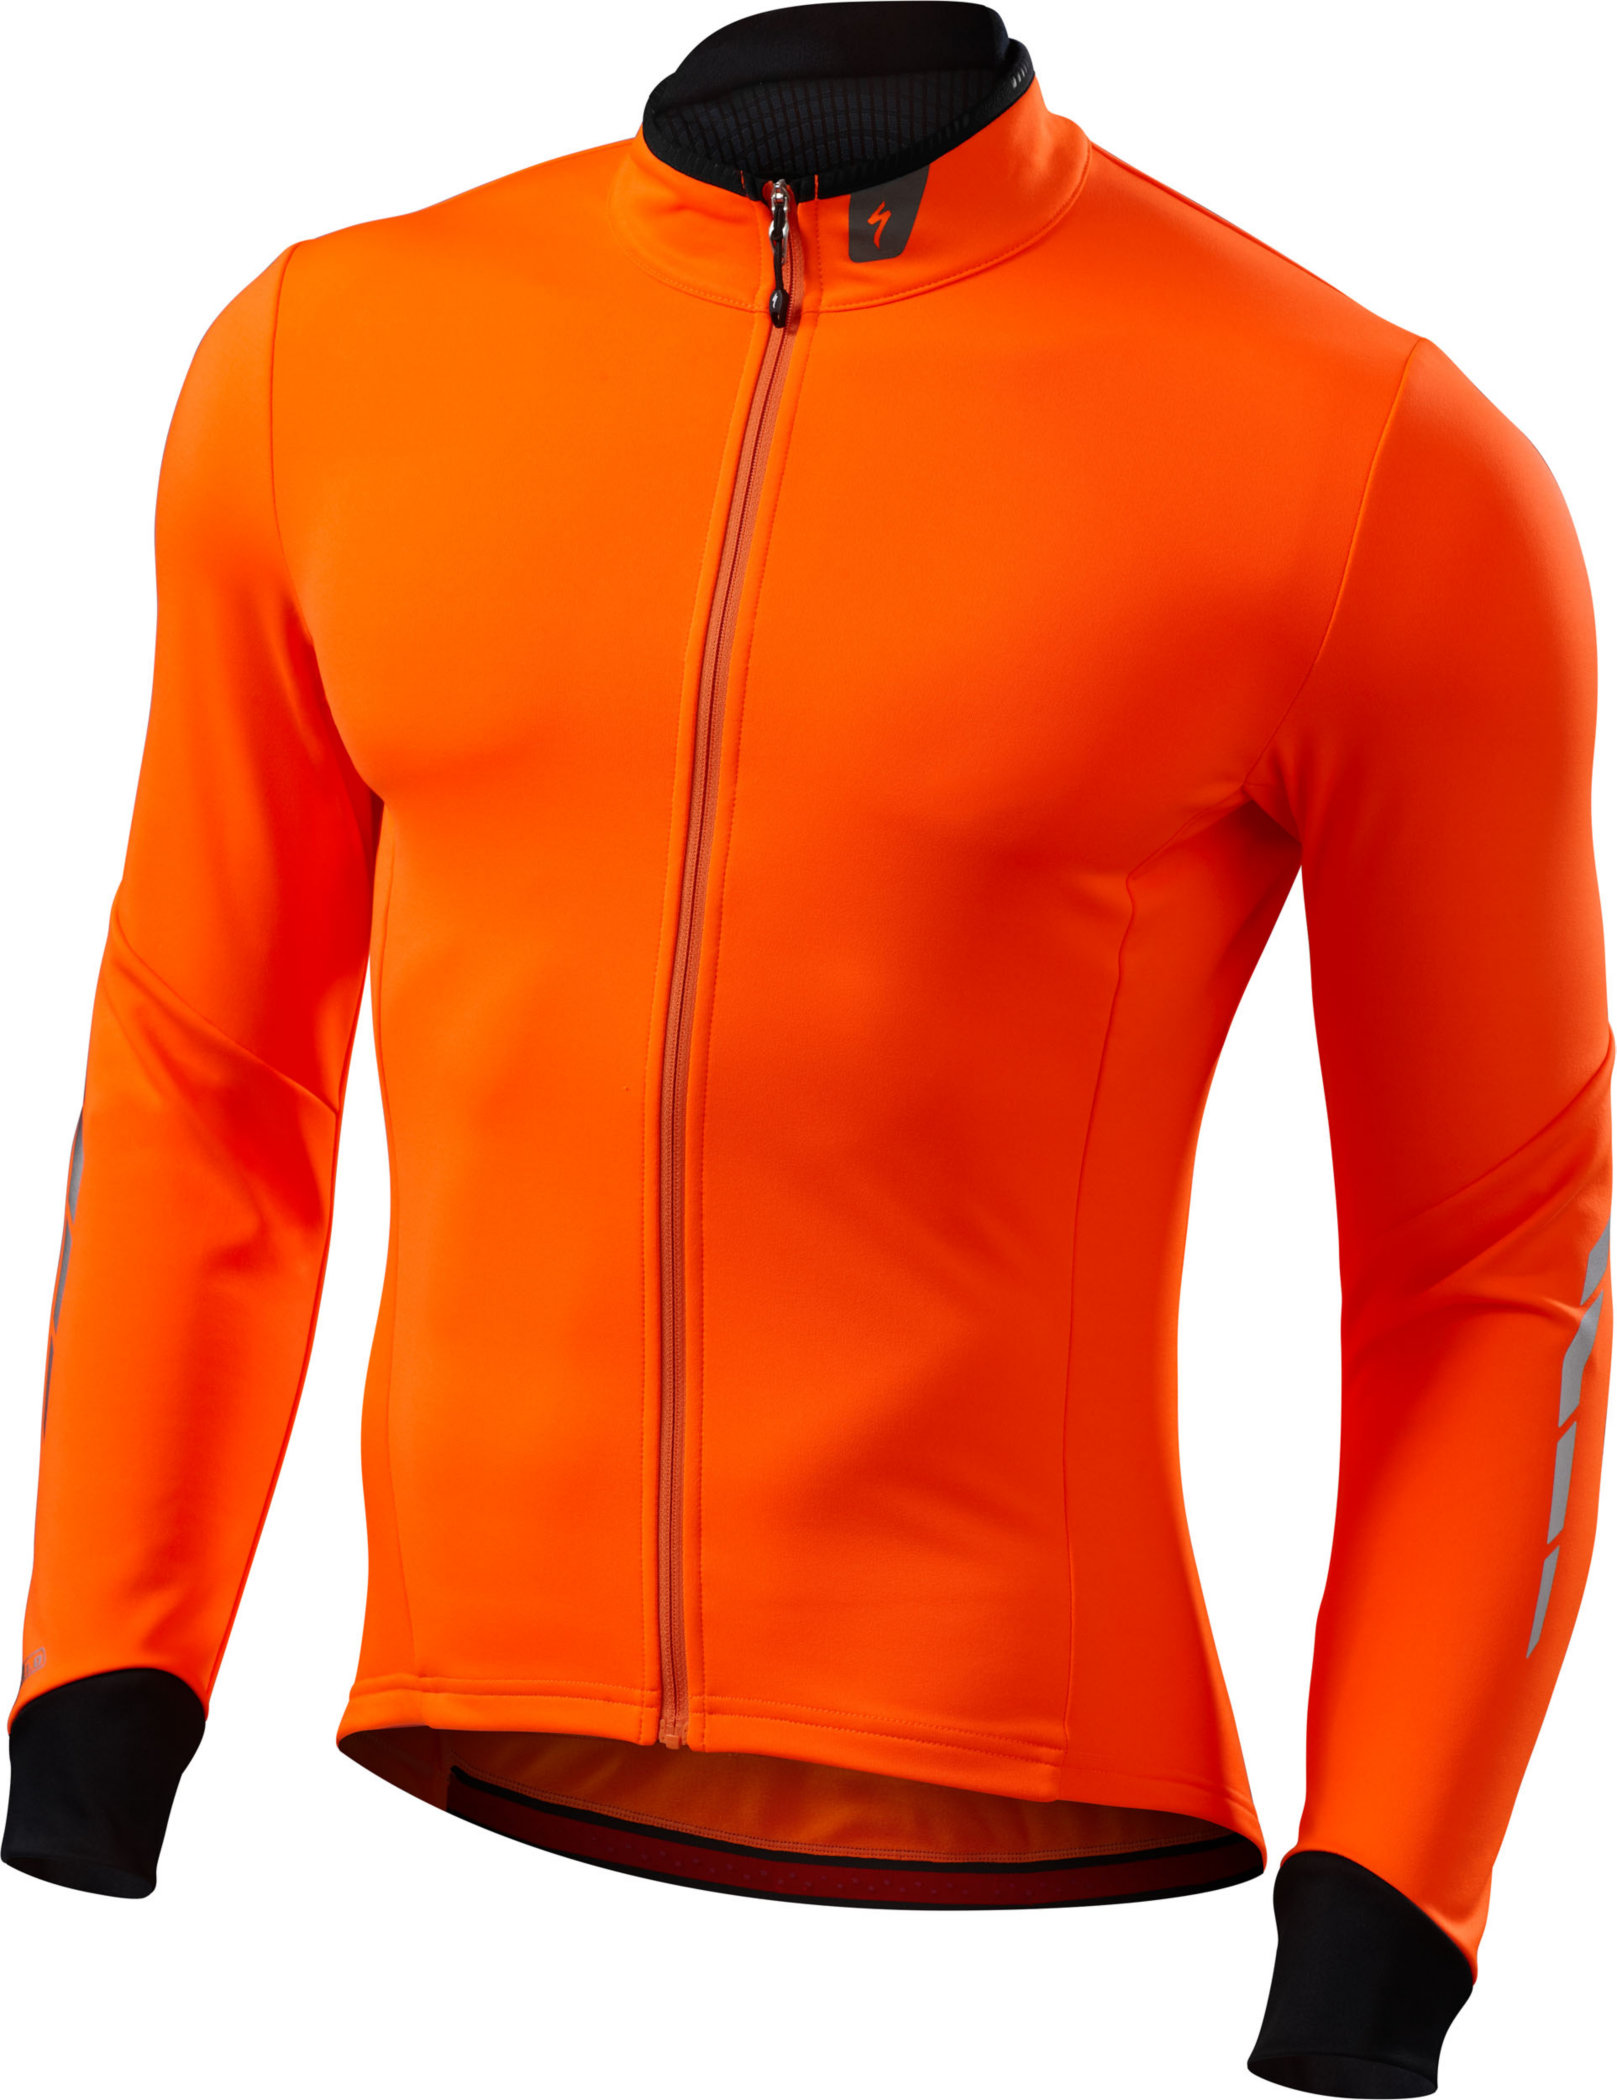 Specialized Element 1.0 Jacket   Neon Orange Medium - Alpha Bikes